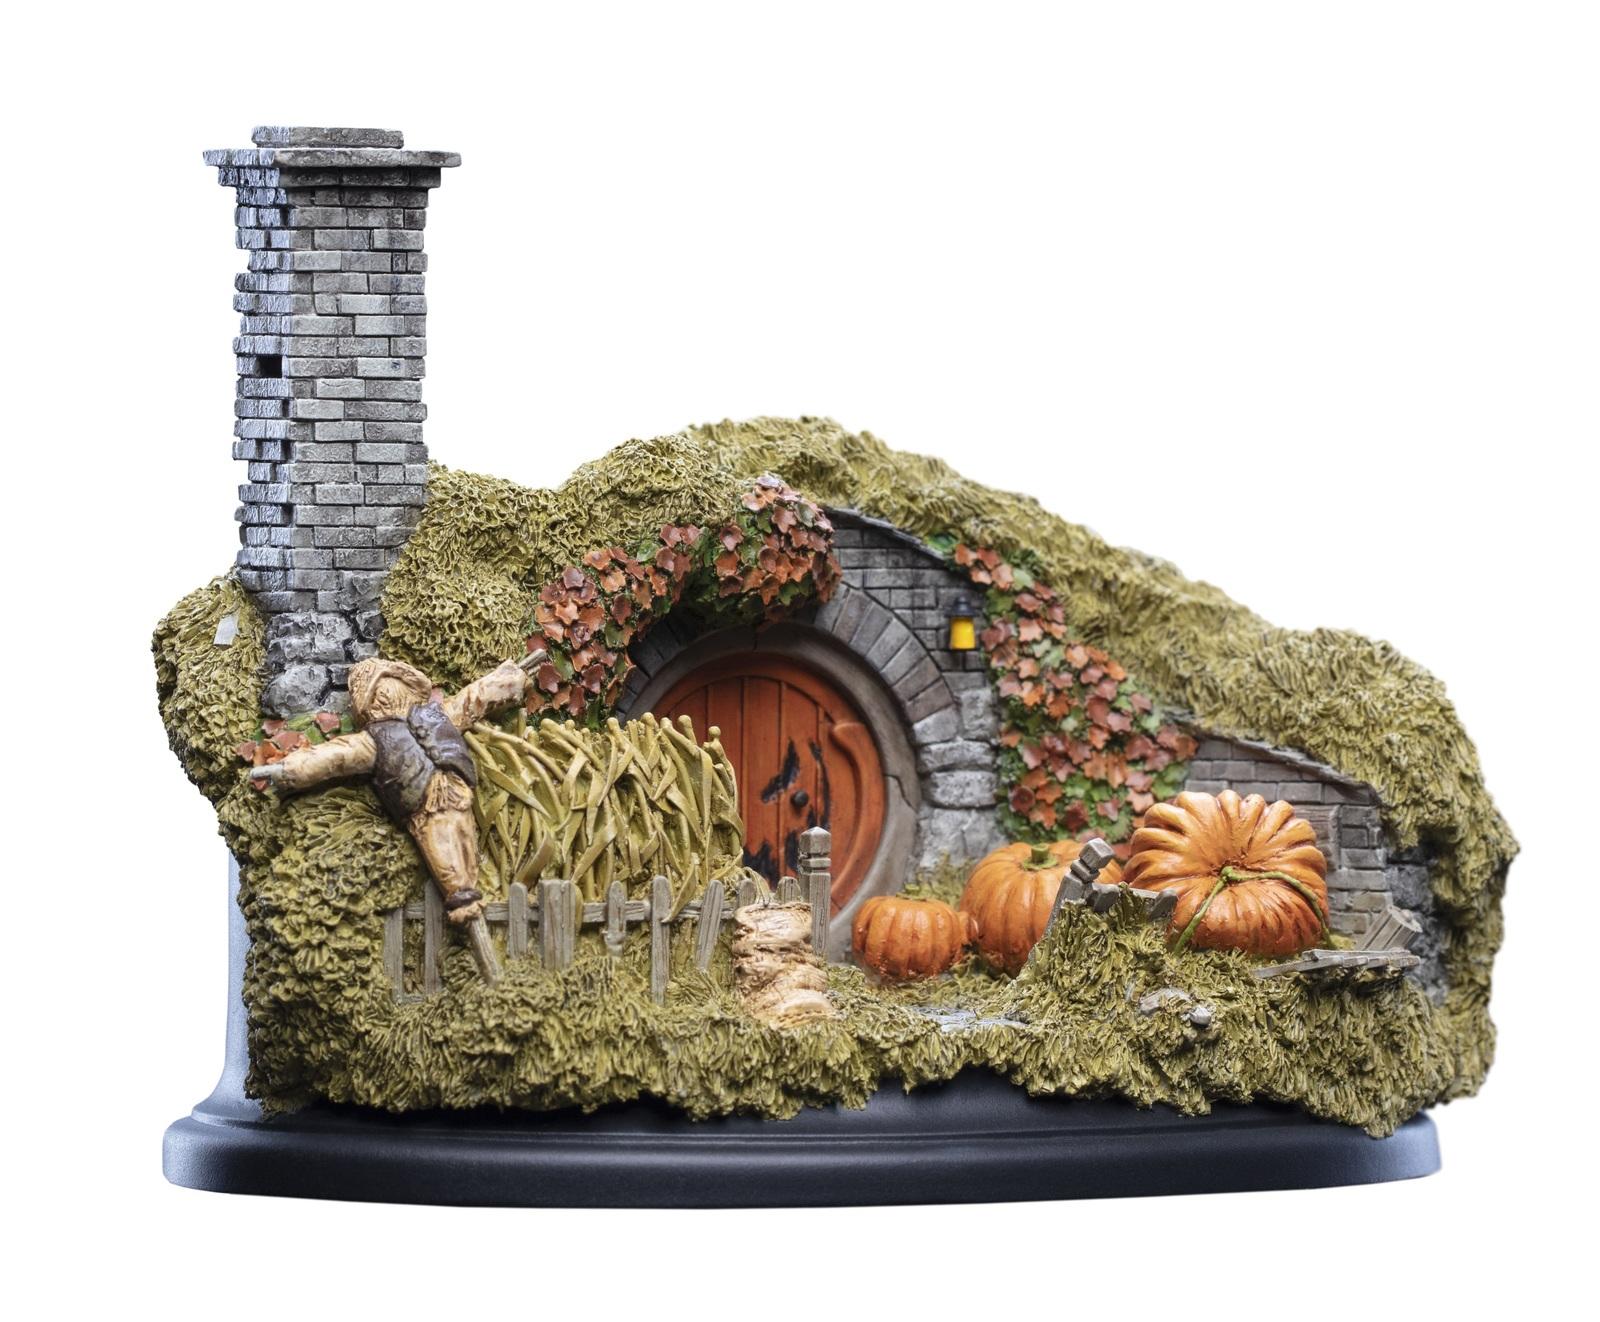 The Hobbit: 16 Bagshot Row (Halloween Edition) - Hobbit Hole Statue image